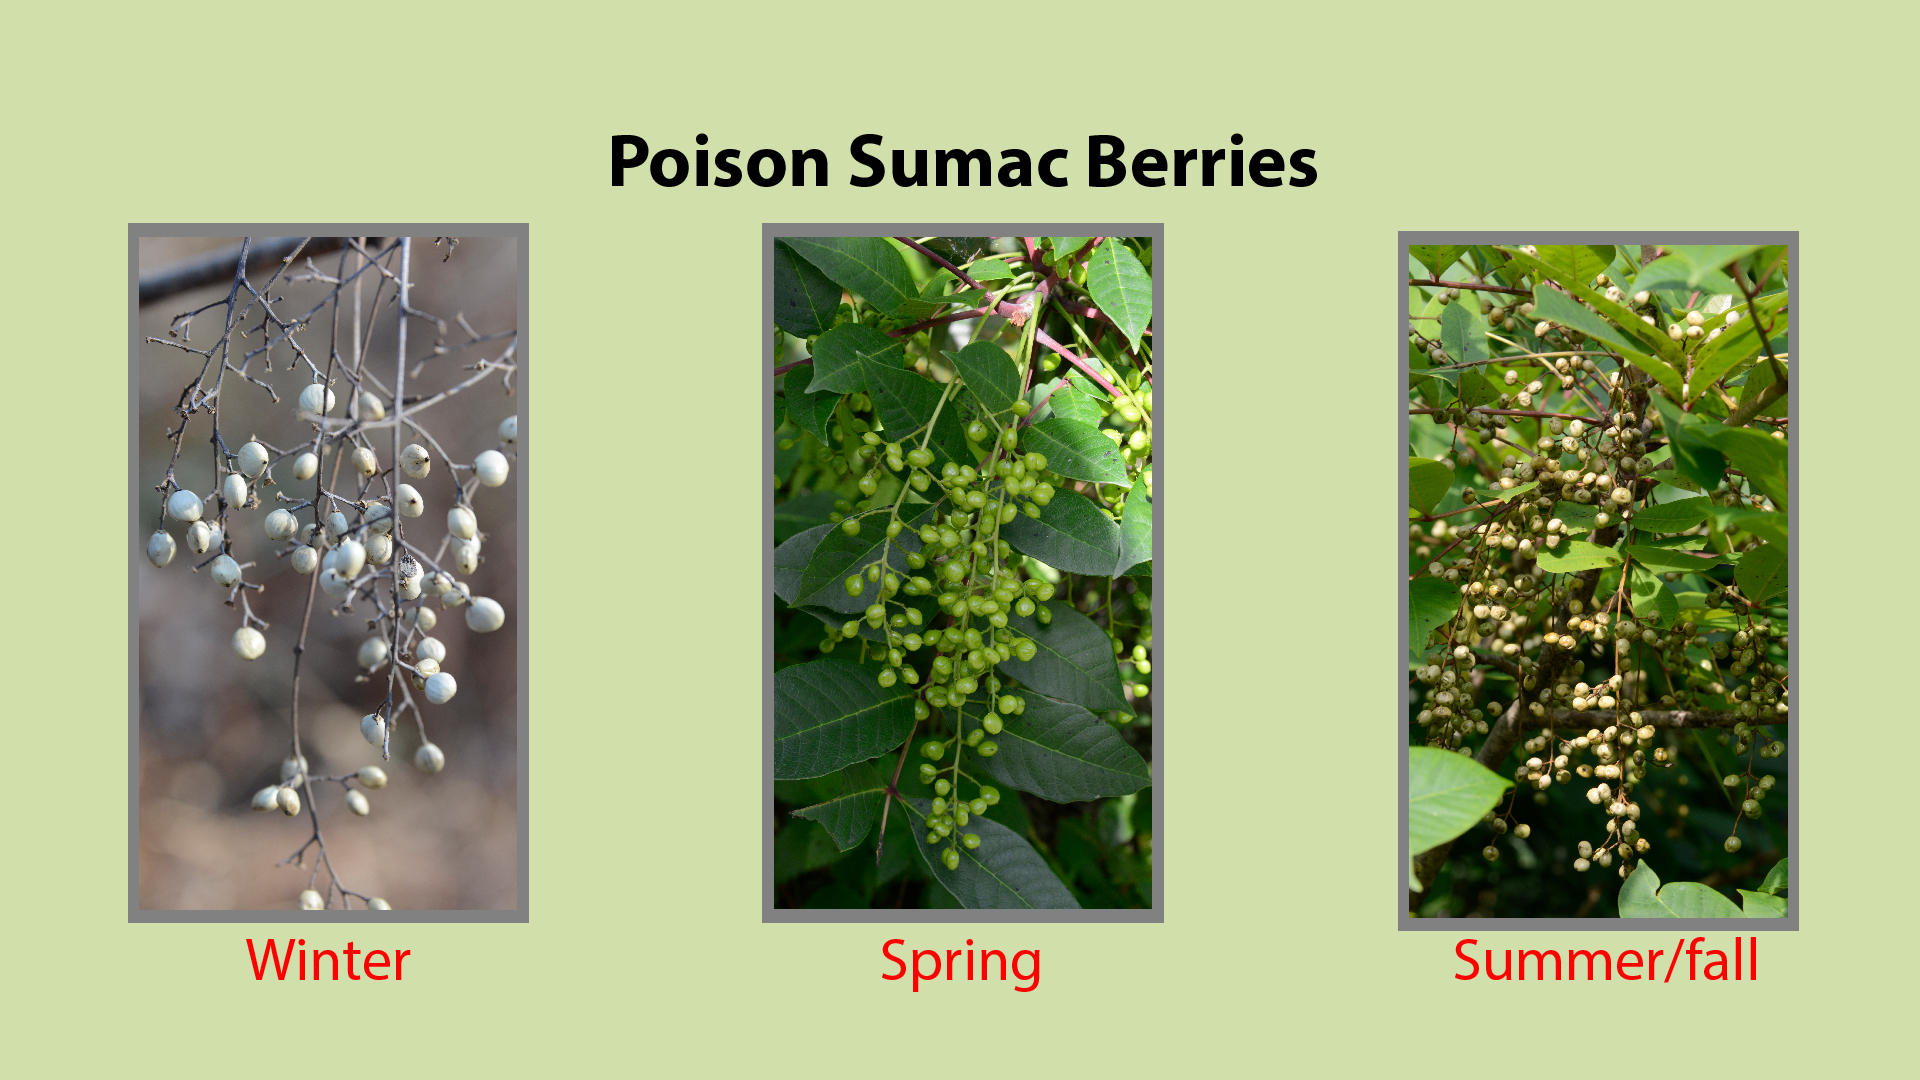 Poison Sumac Berries